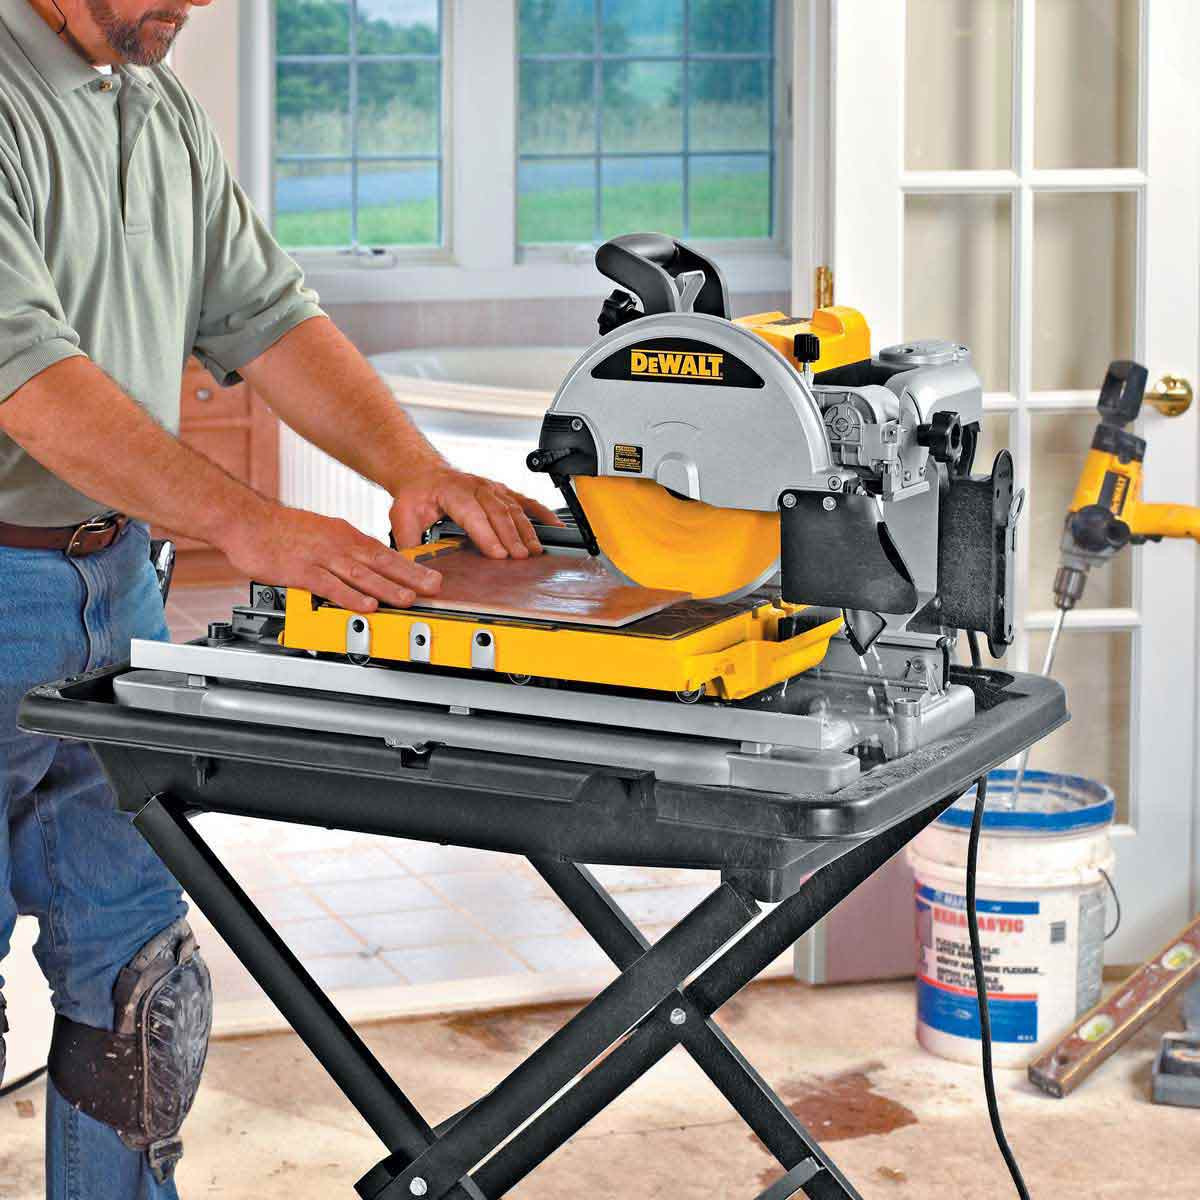 D24000 Tile Saw cutting tile